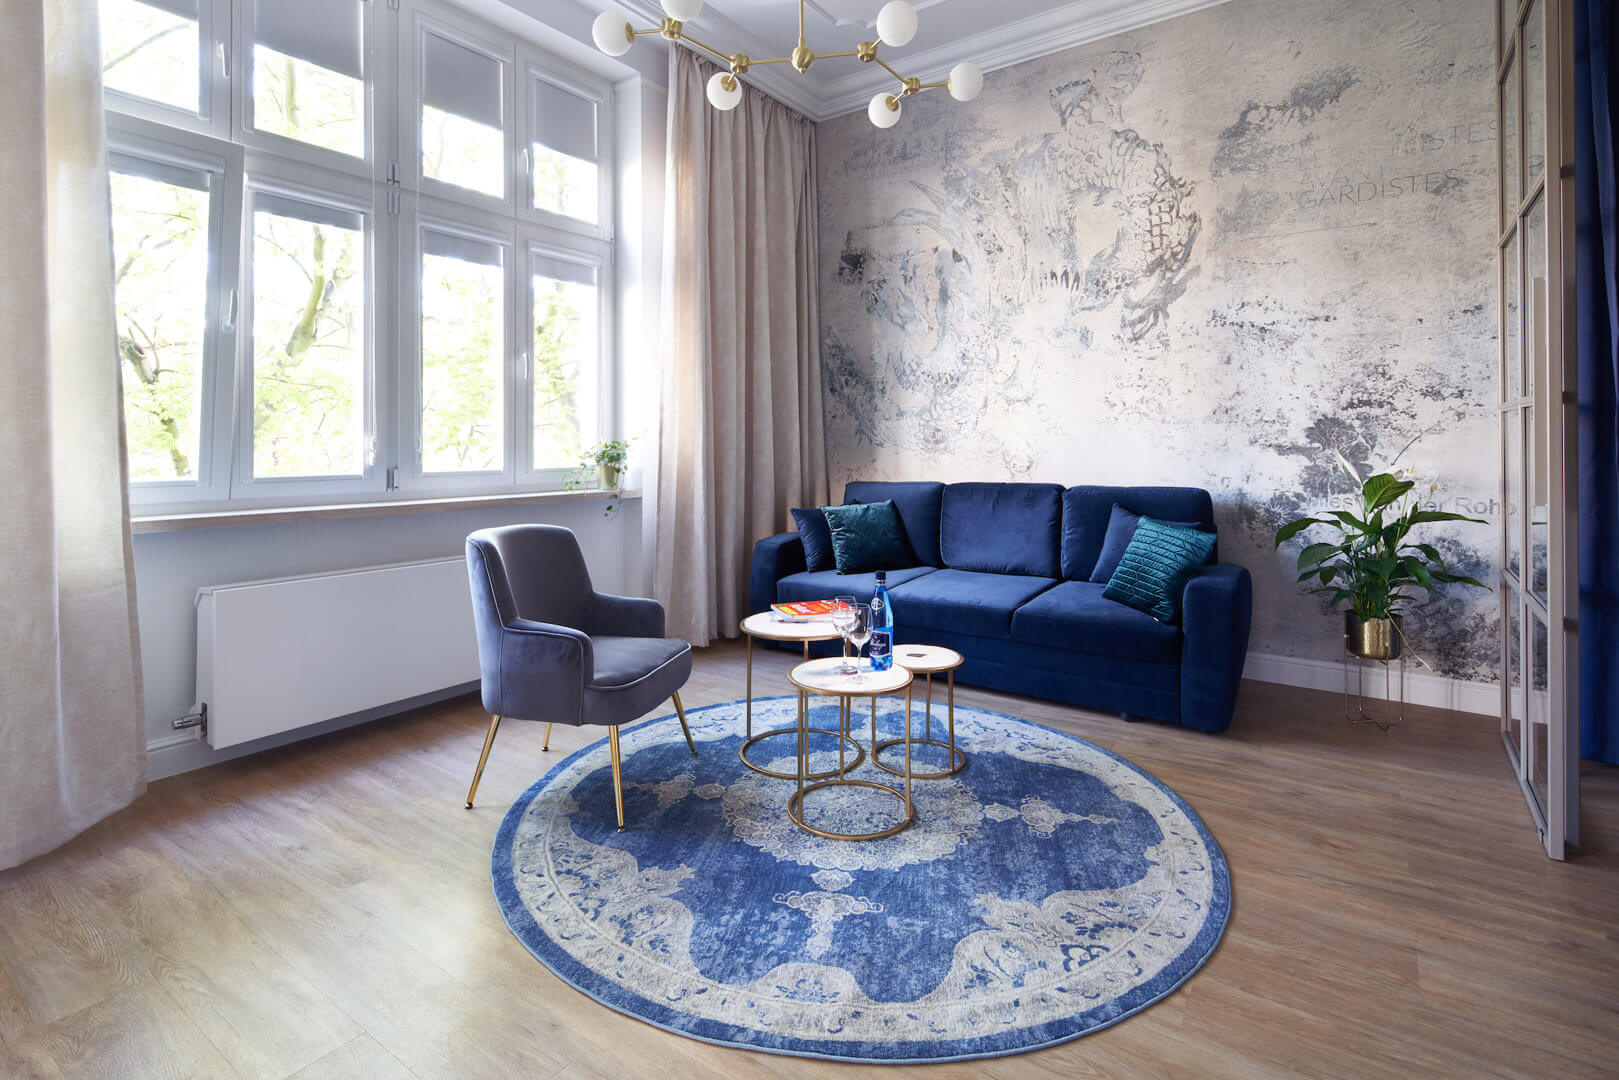 Apartamenty Sopot & Gdańsk – OneApartments